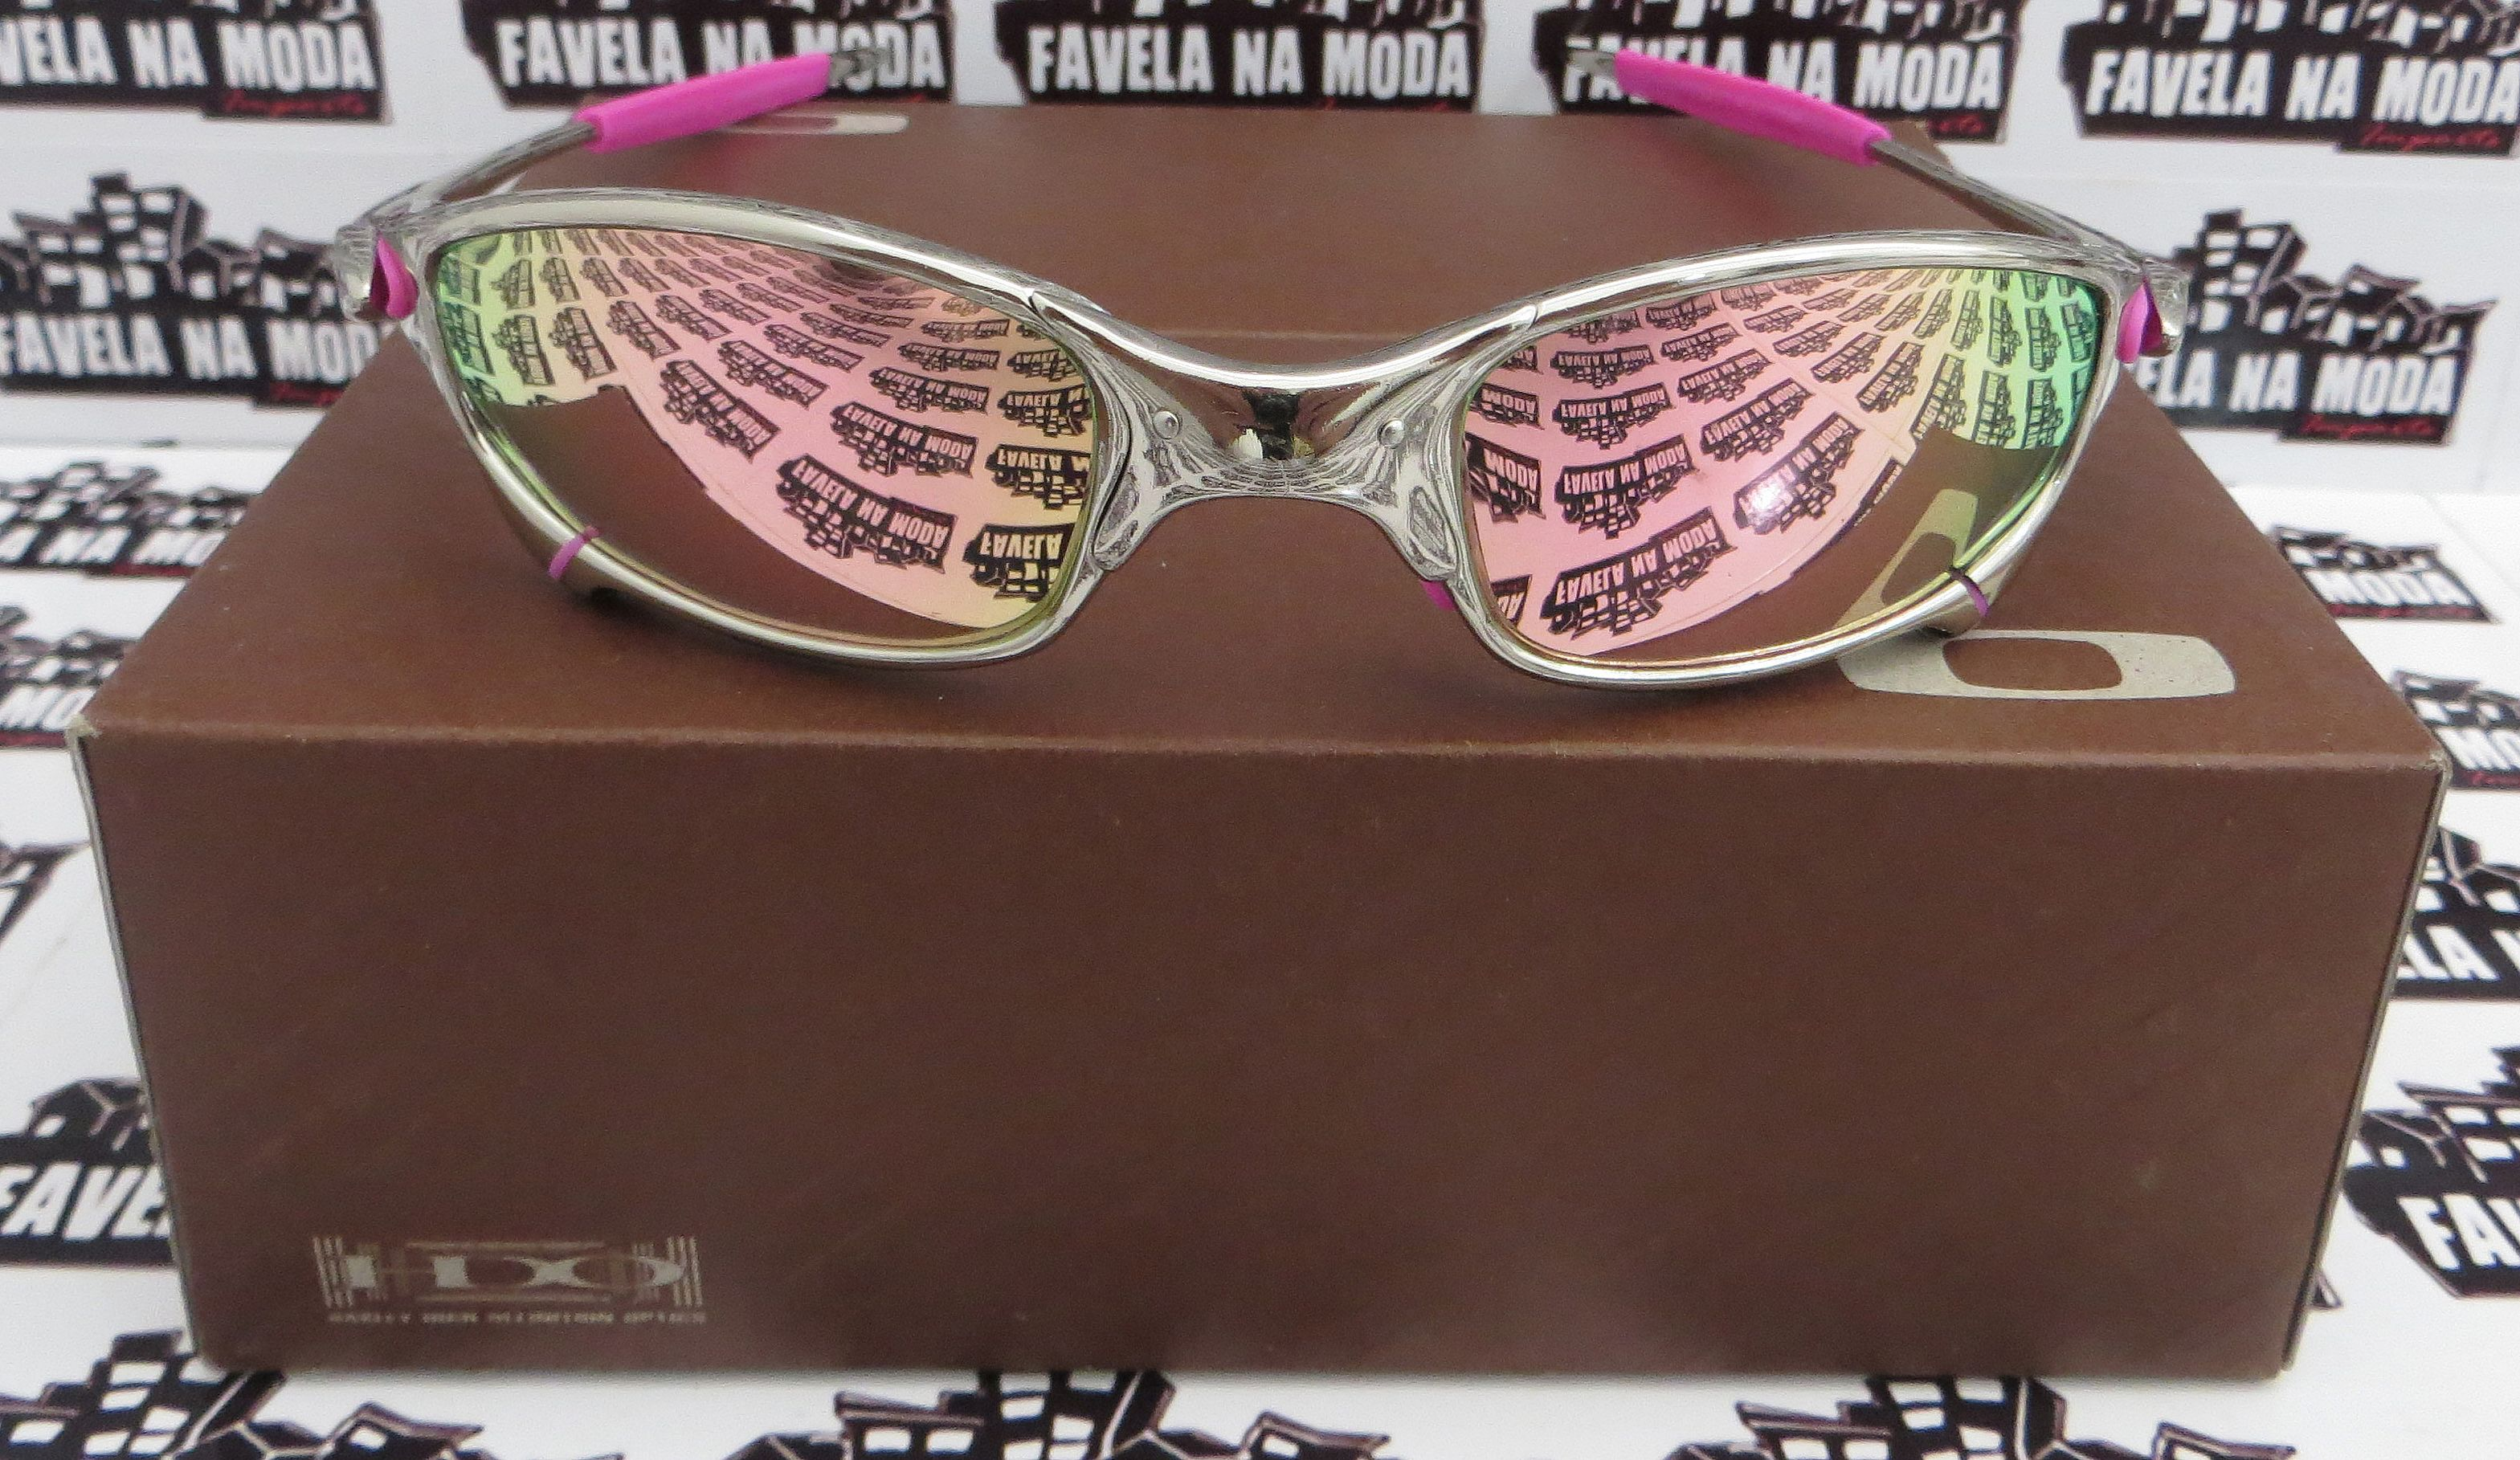 b043517bd993b Óculos - Óculos Oakley - Juliet - Favela na Moda Imports